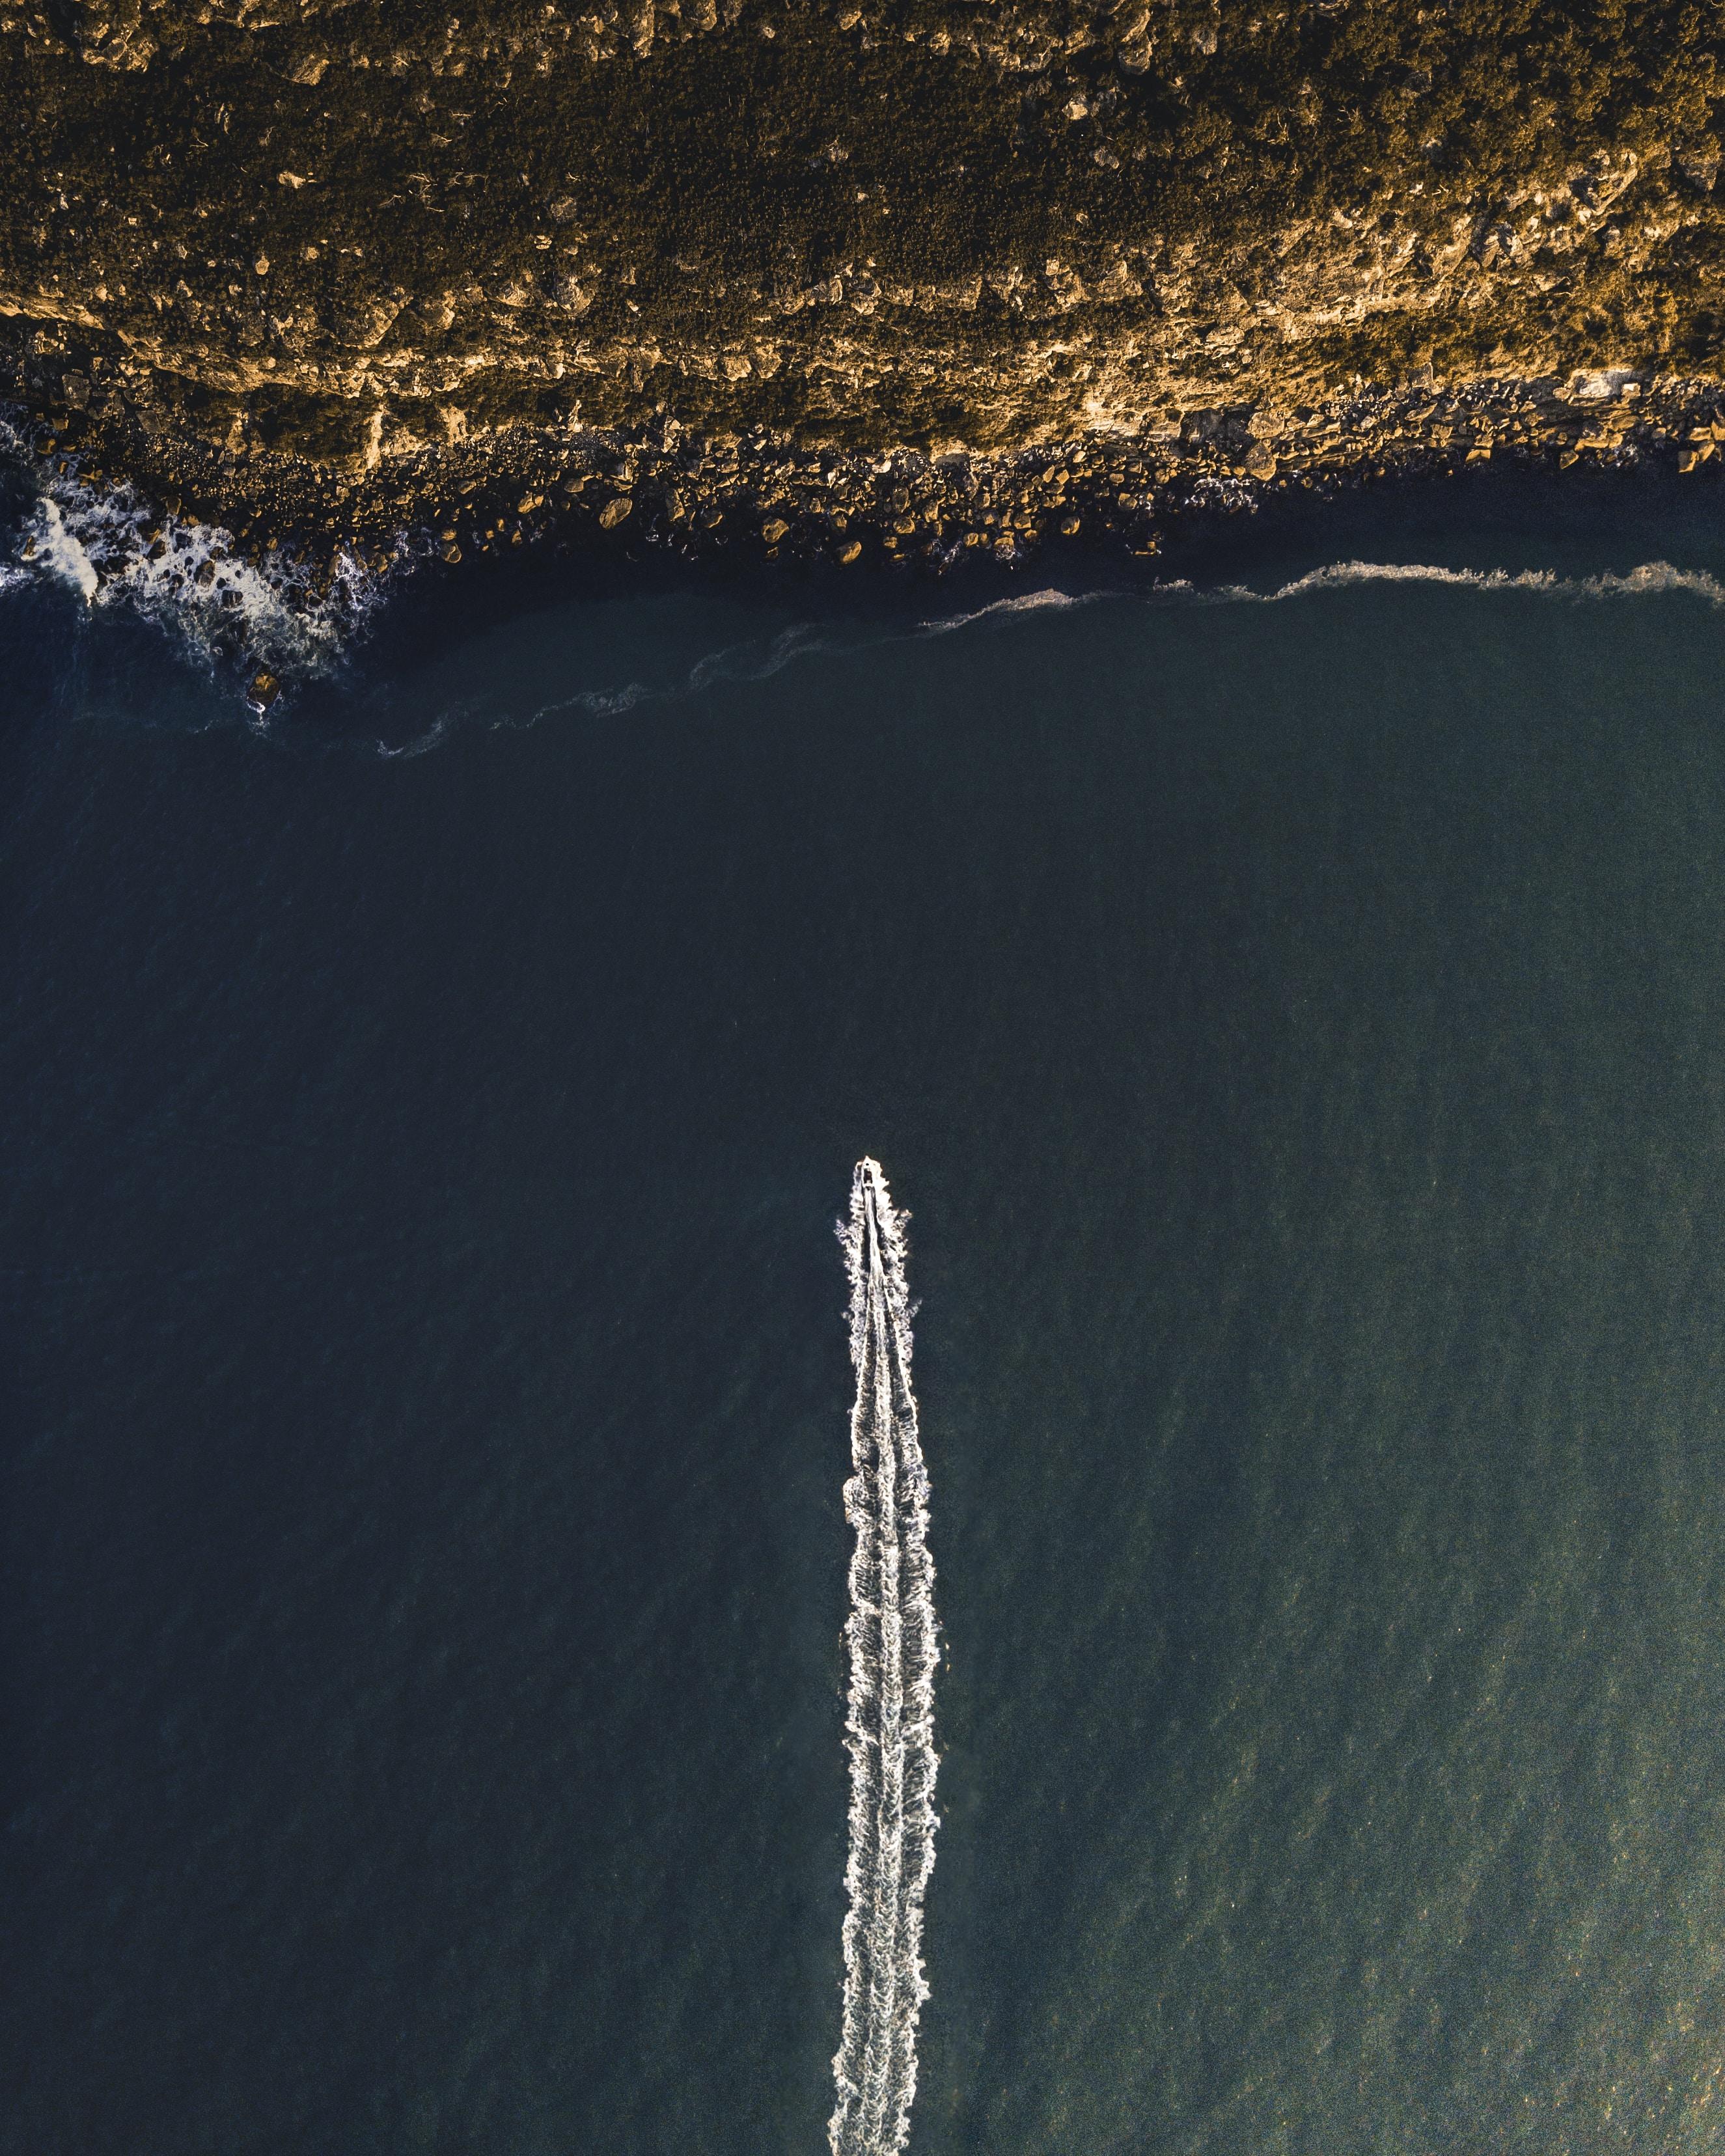 bird's eye view photography of speedboat towards coastline